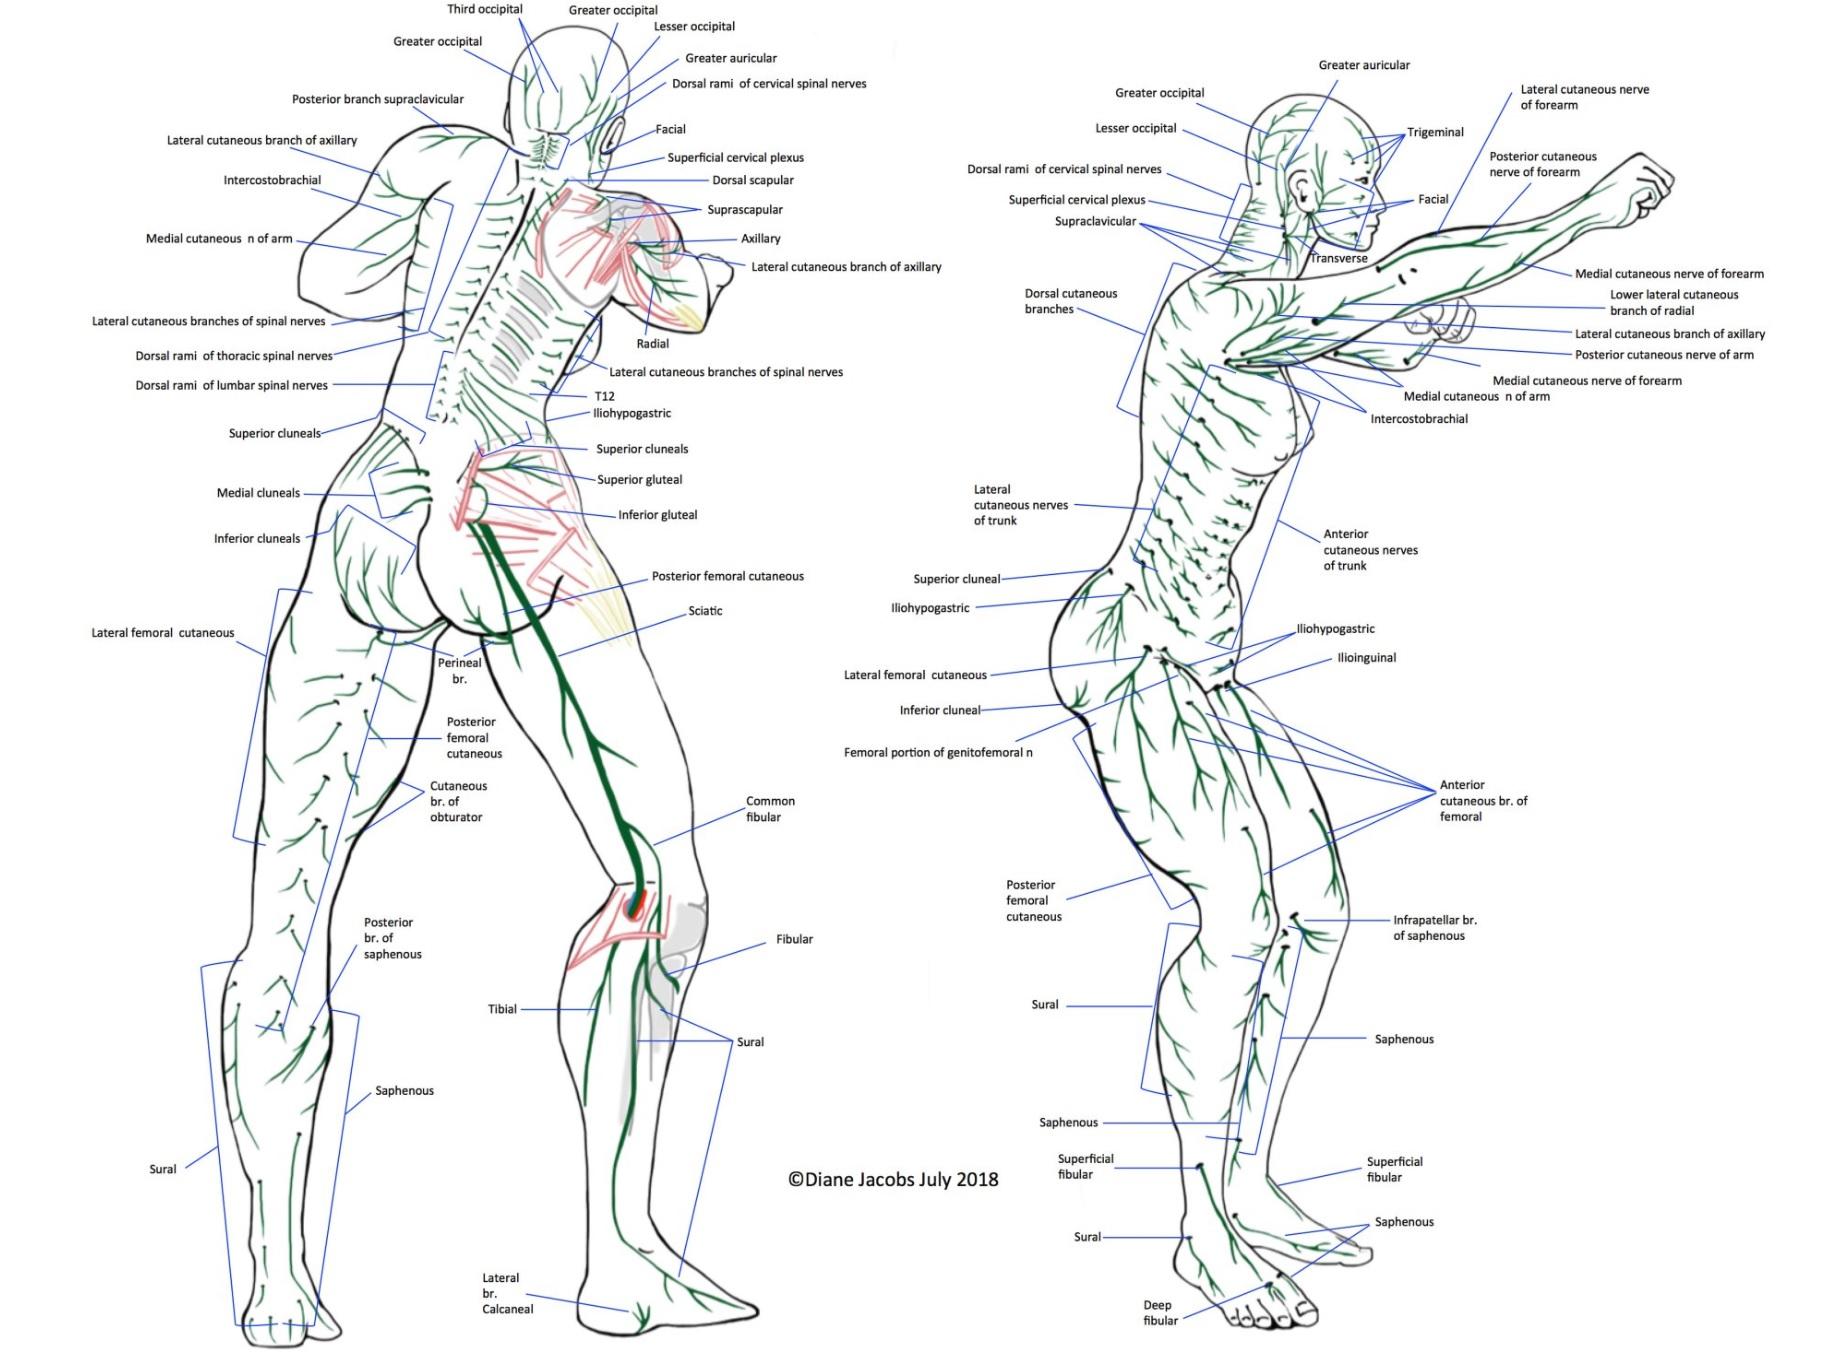 Nervous System Map - Full Body